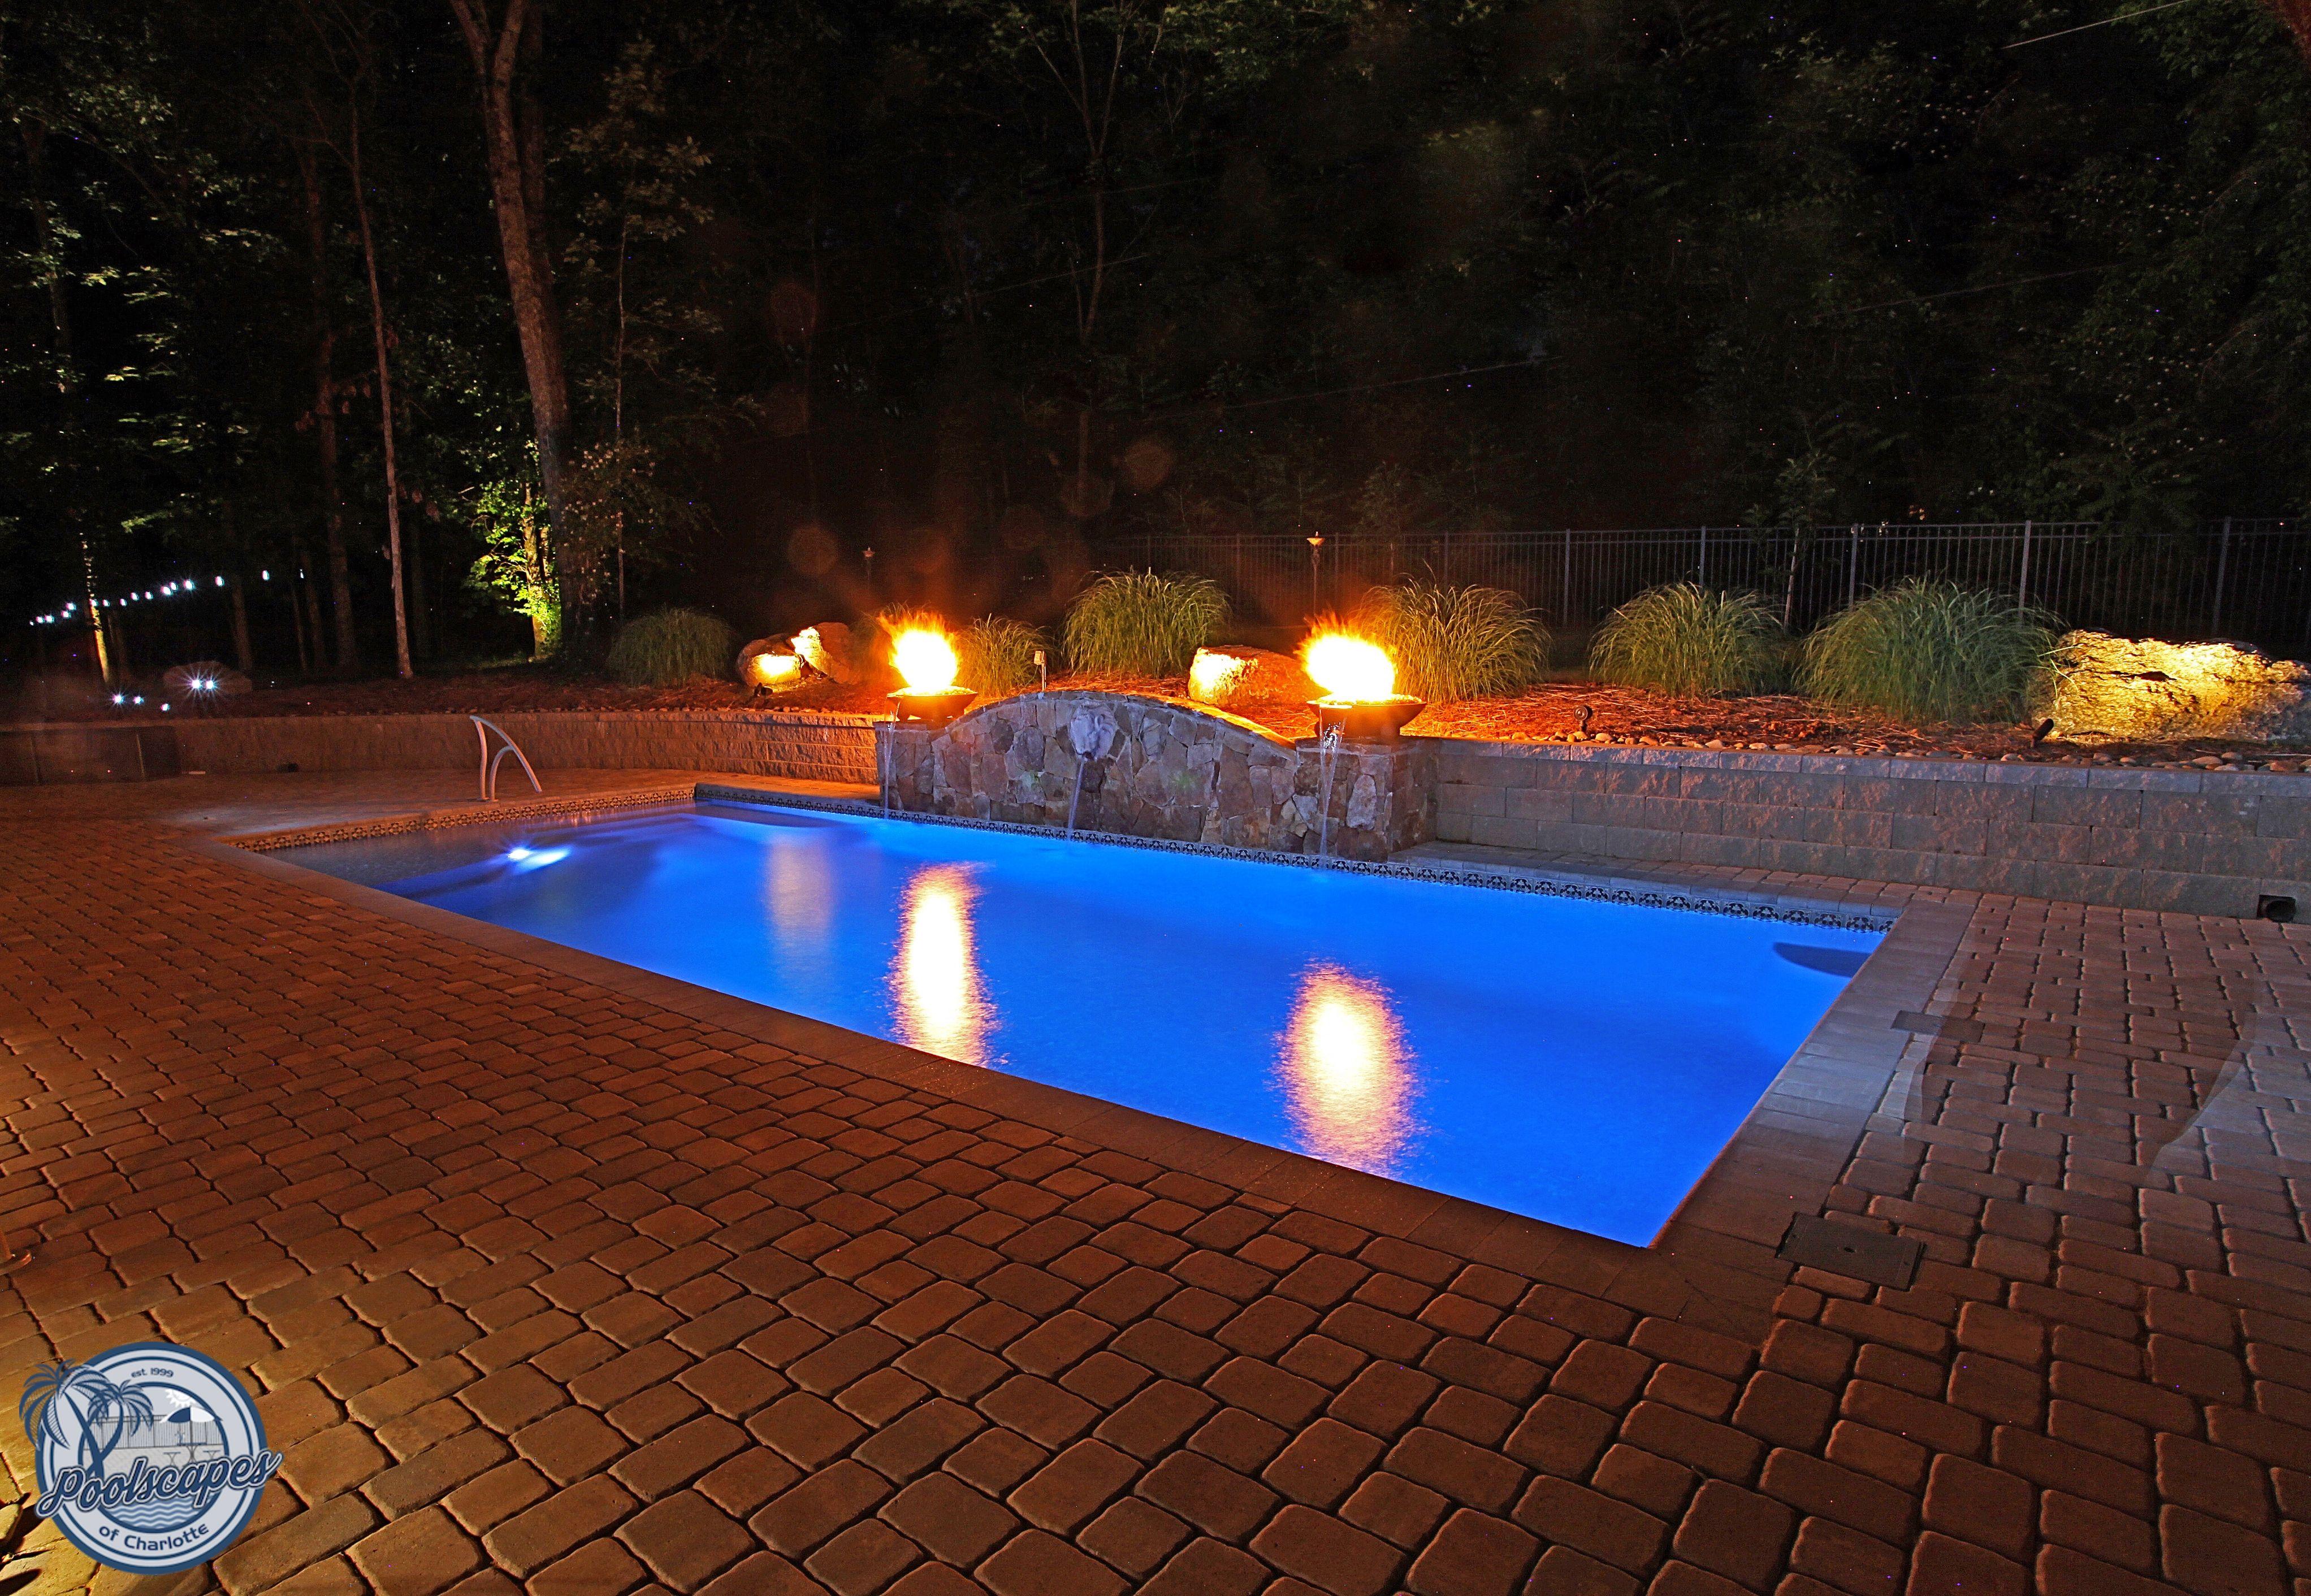 The Great Lakes Pool Lake Swimming Pool Fiberglass Pools Fiberglass Swimming Pools